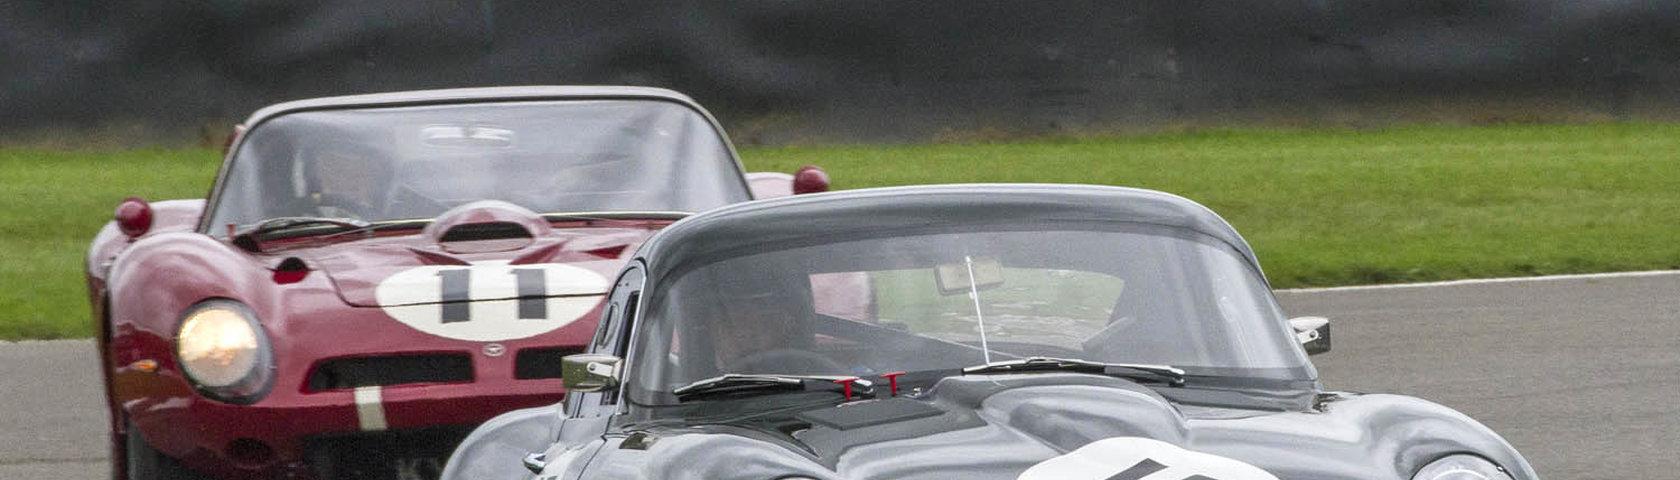 Tt Lightweight Low Drag Coupe Ahead Of Bizzarini Rg